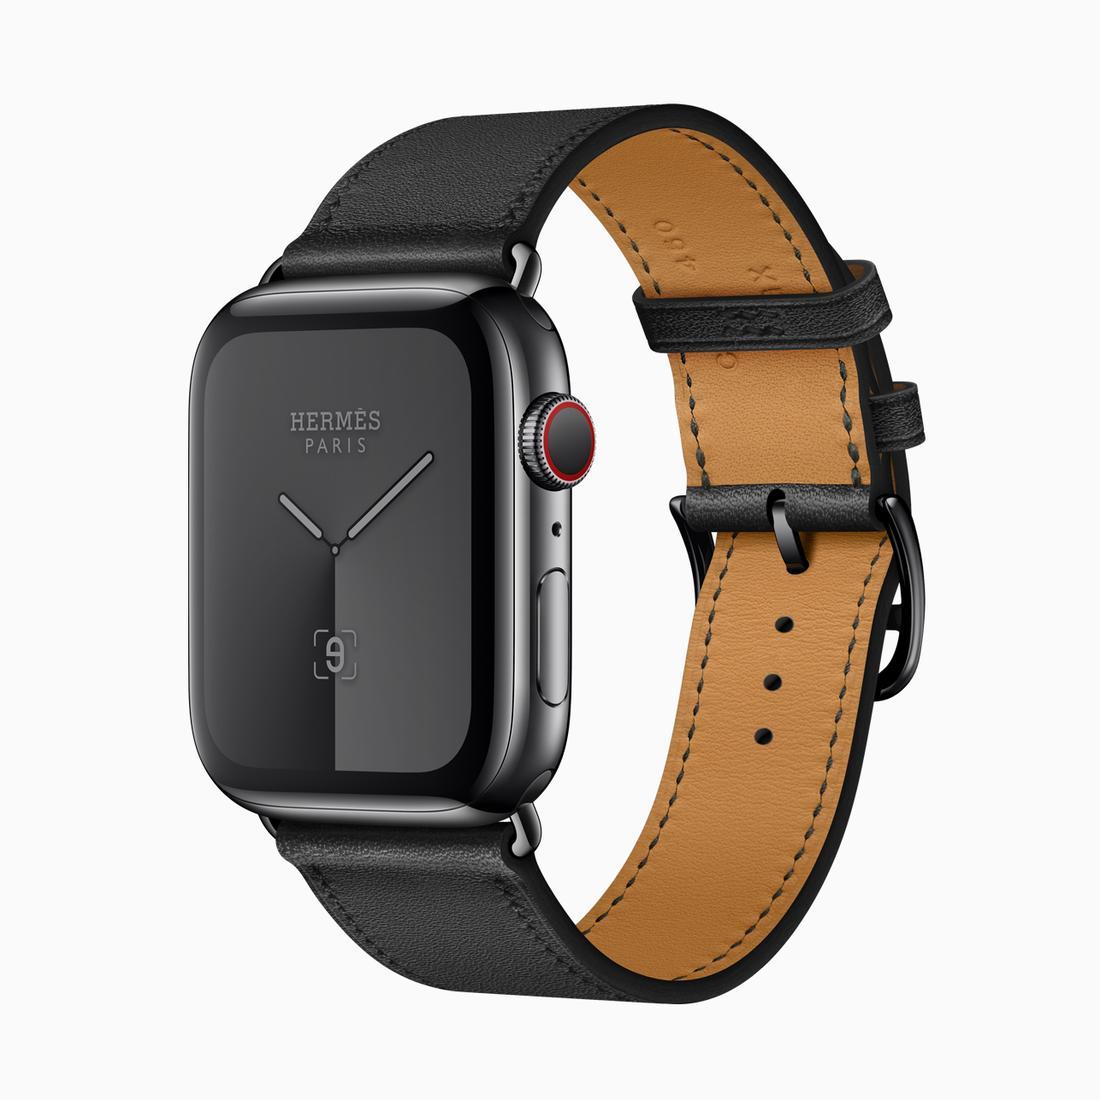 Toll: Apple-Watch-Verkäufe stark gestiegen